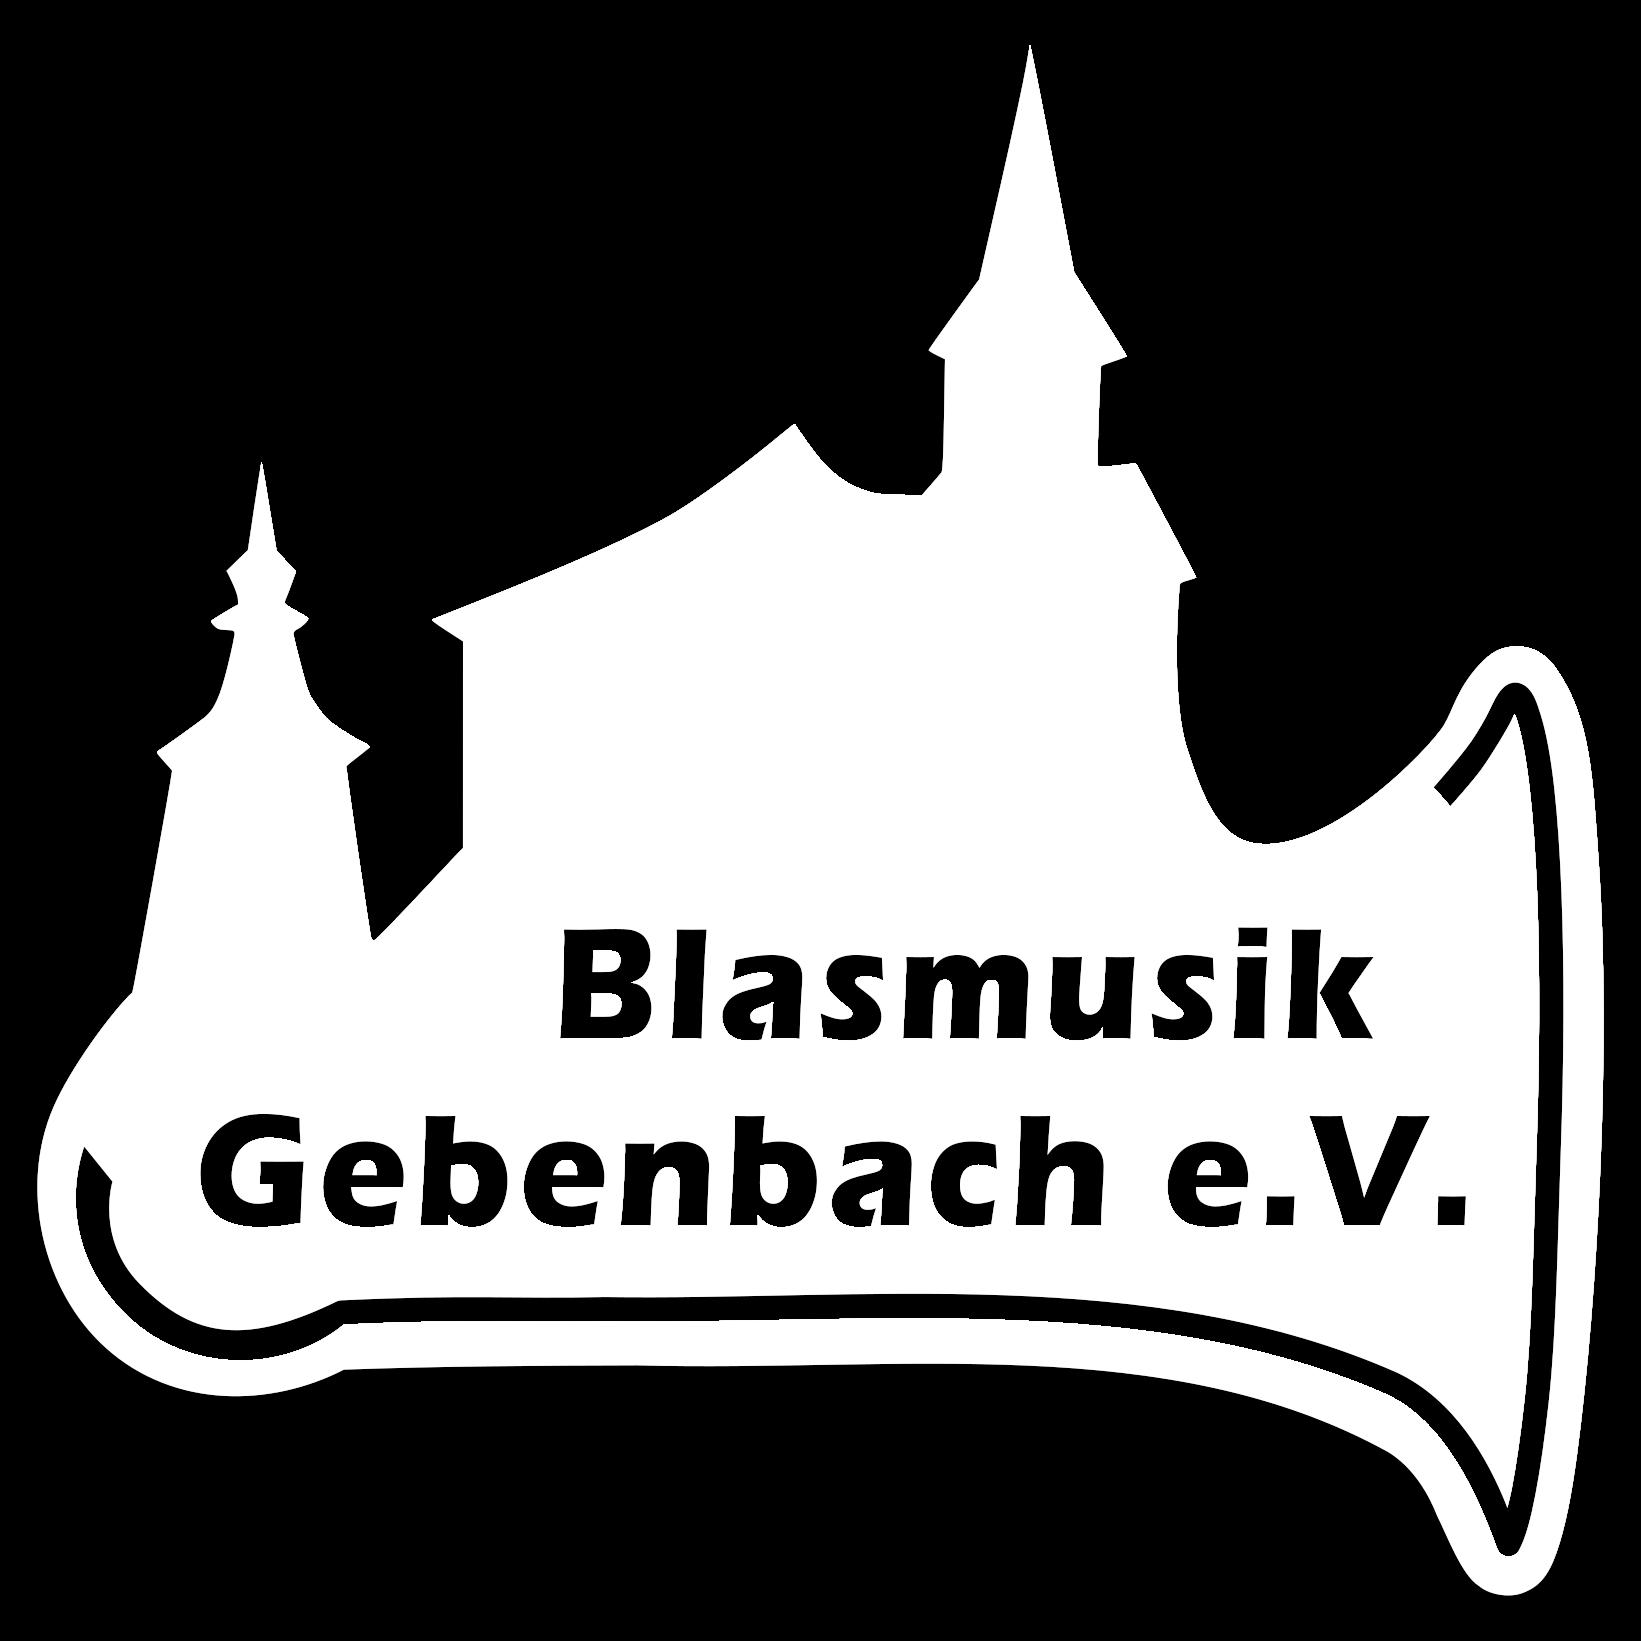 Blasmusik Gebenbach e.V.